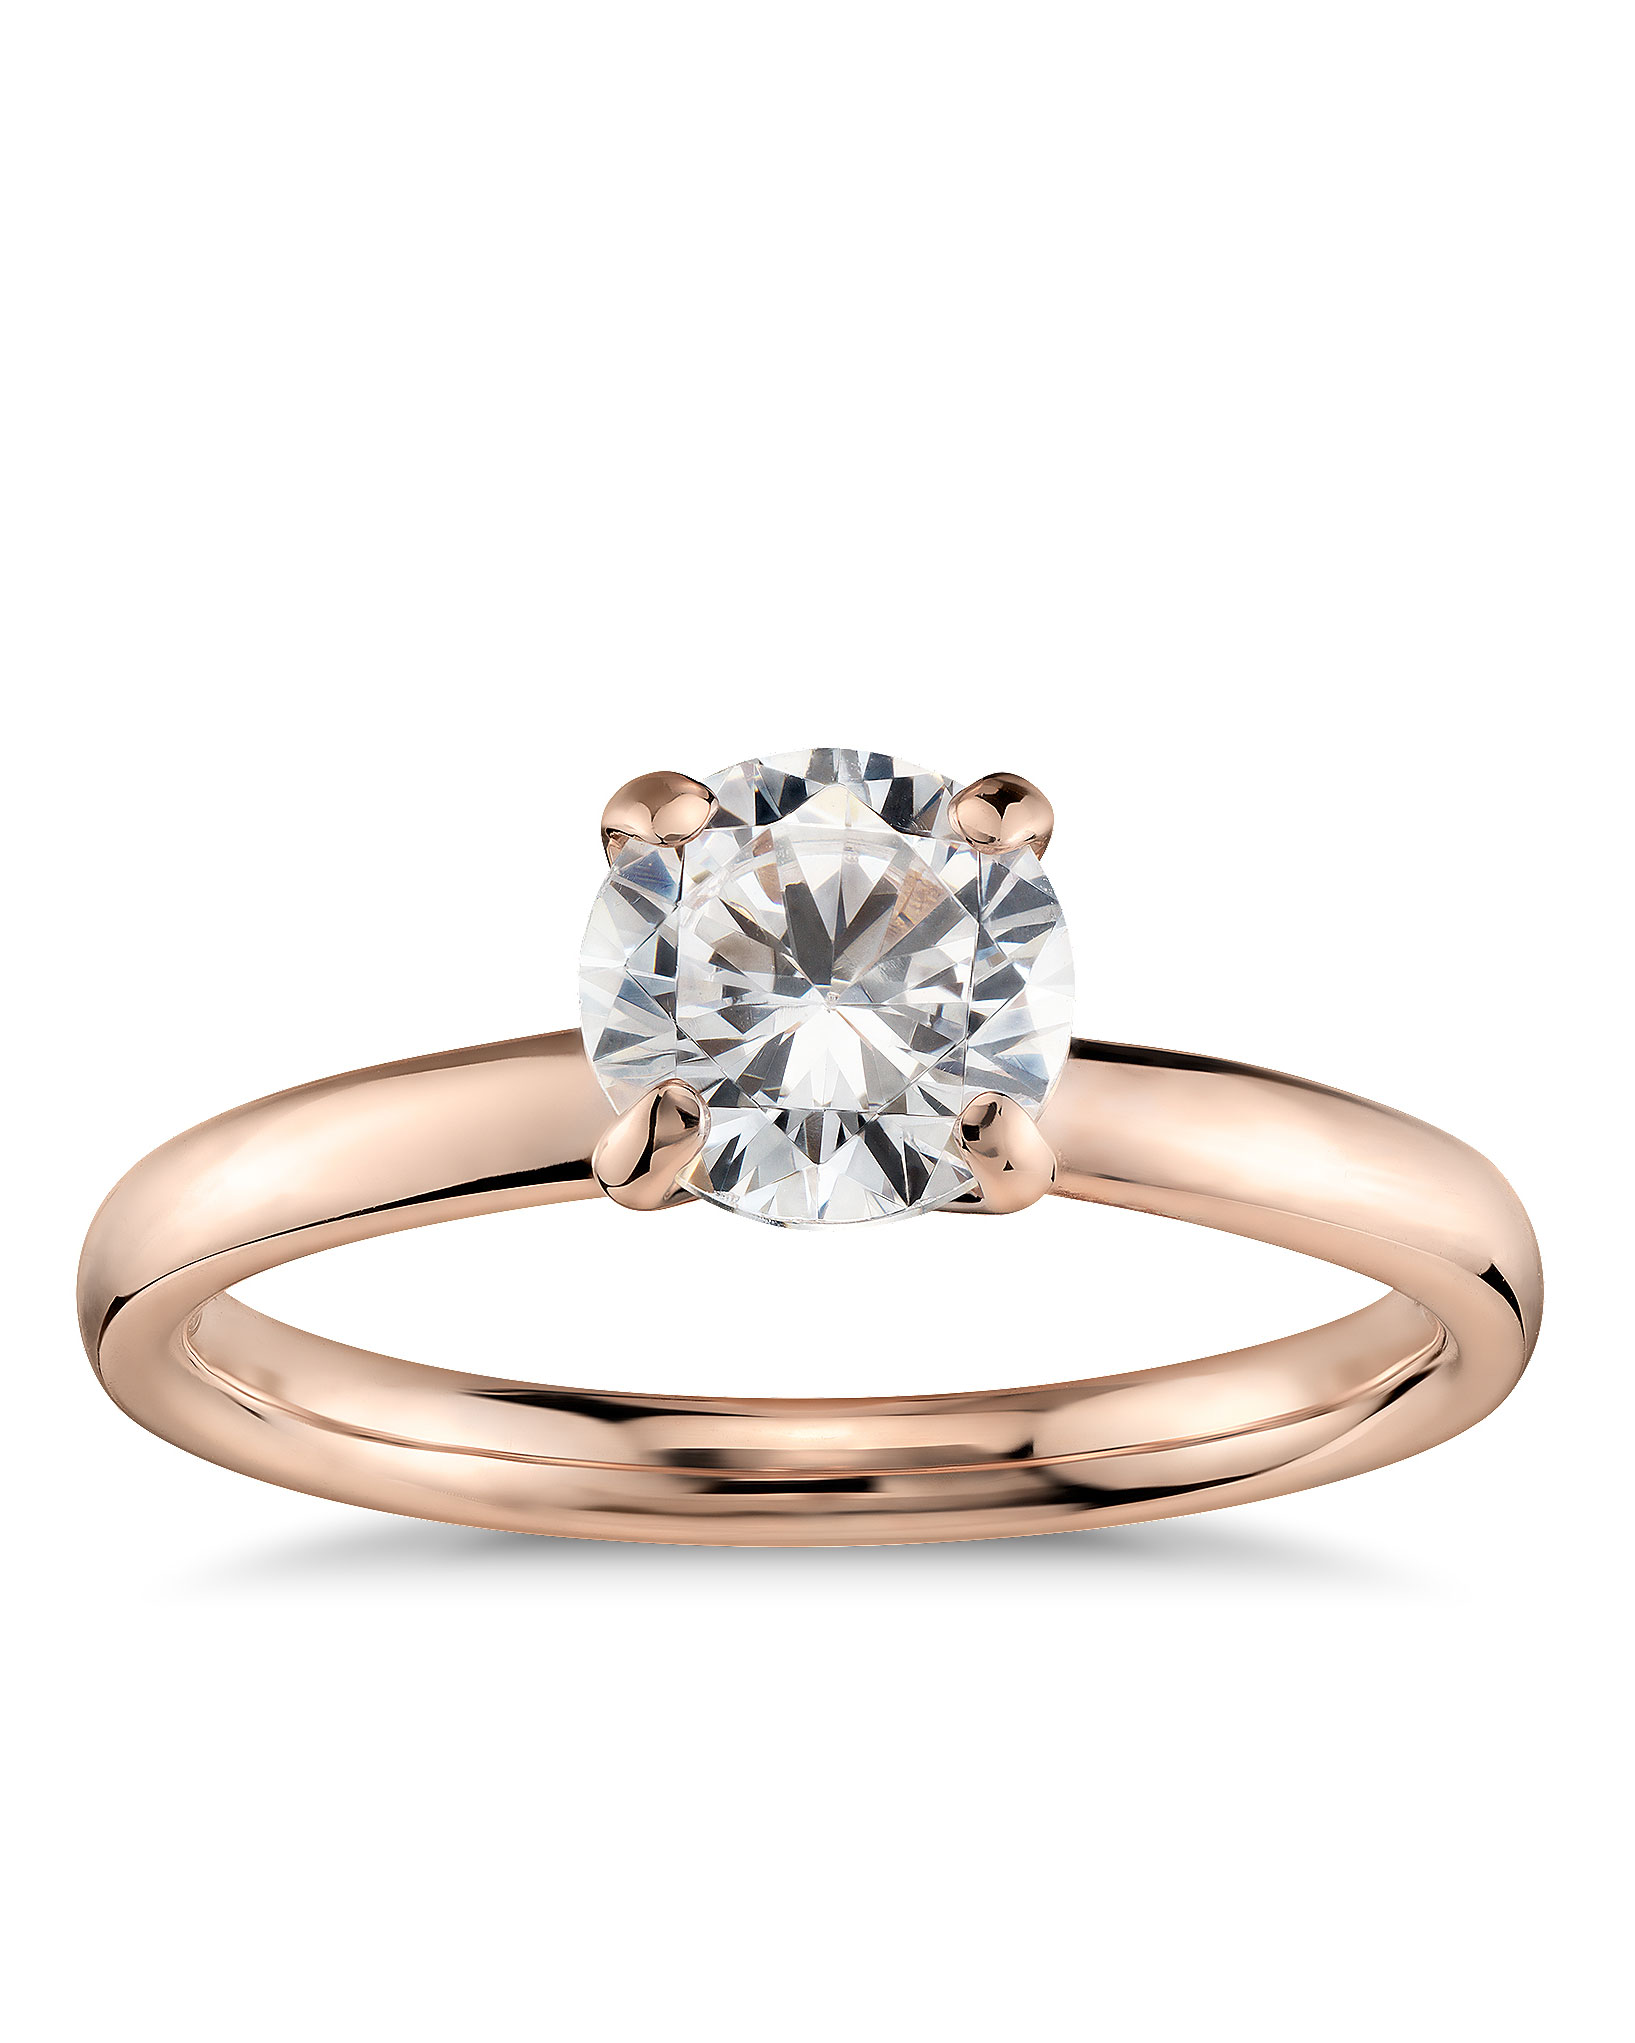 celebrity-rings-monique-lhuillier-blue-nile-lauren-conrad-0316.jpg